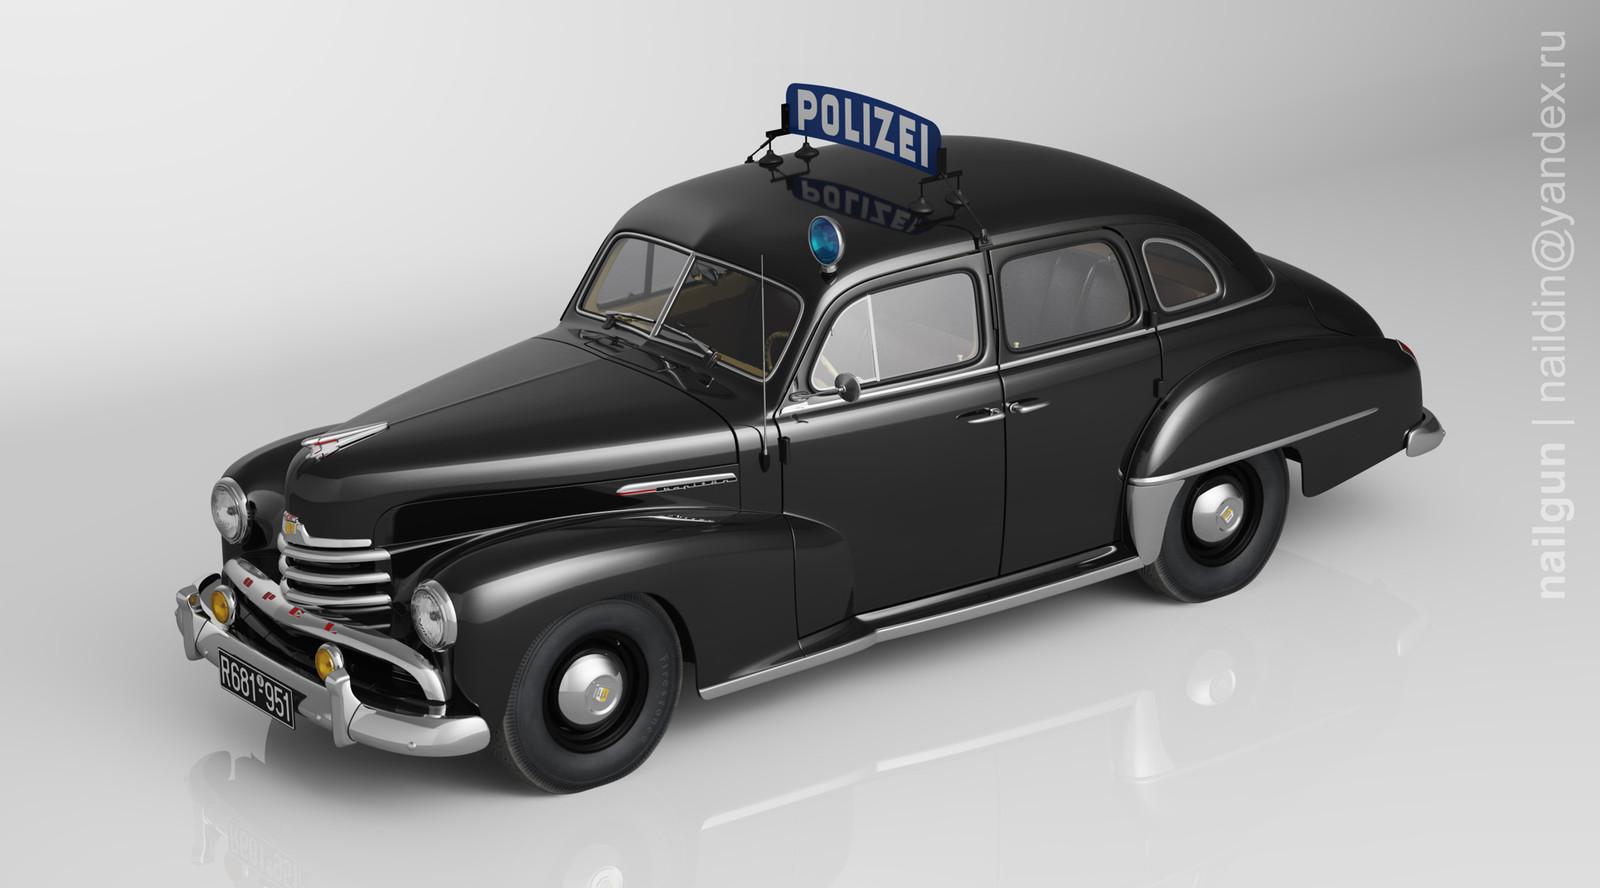 Police West Germany